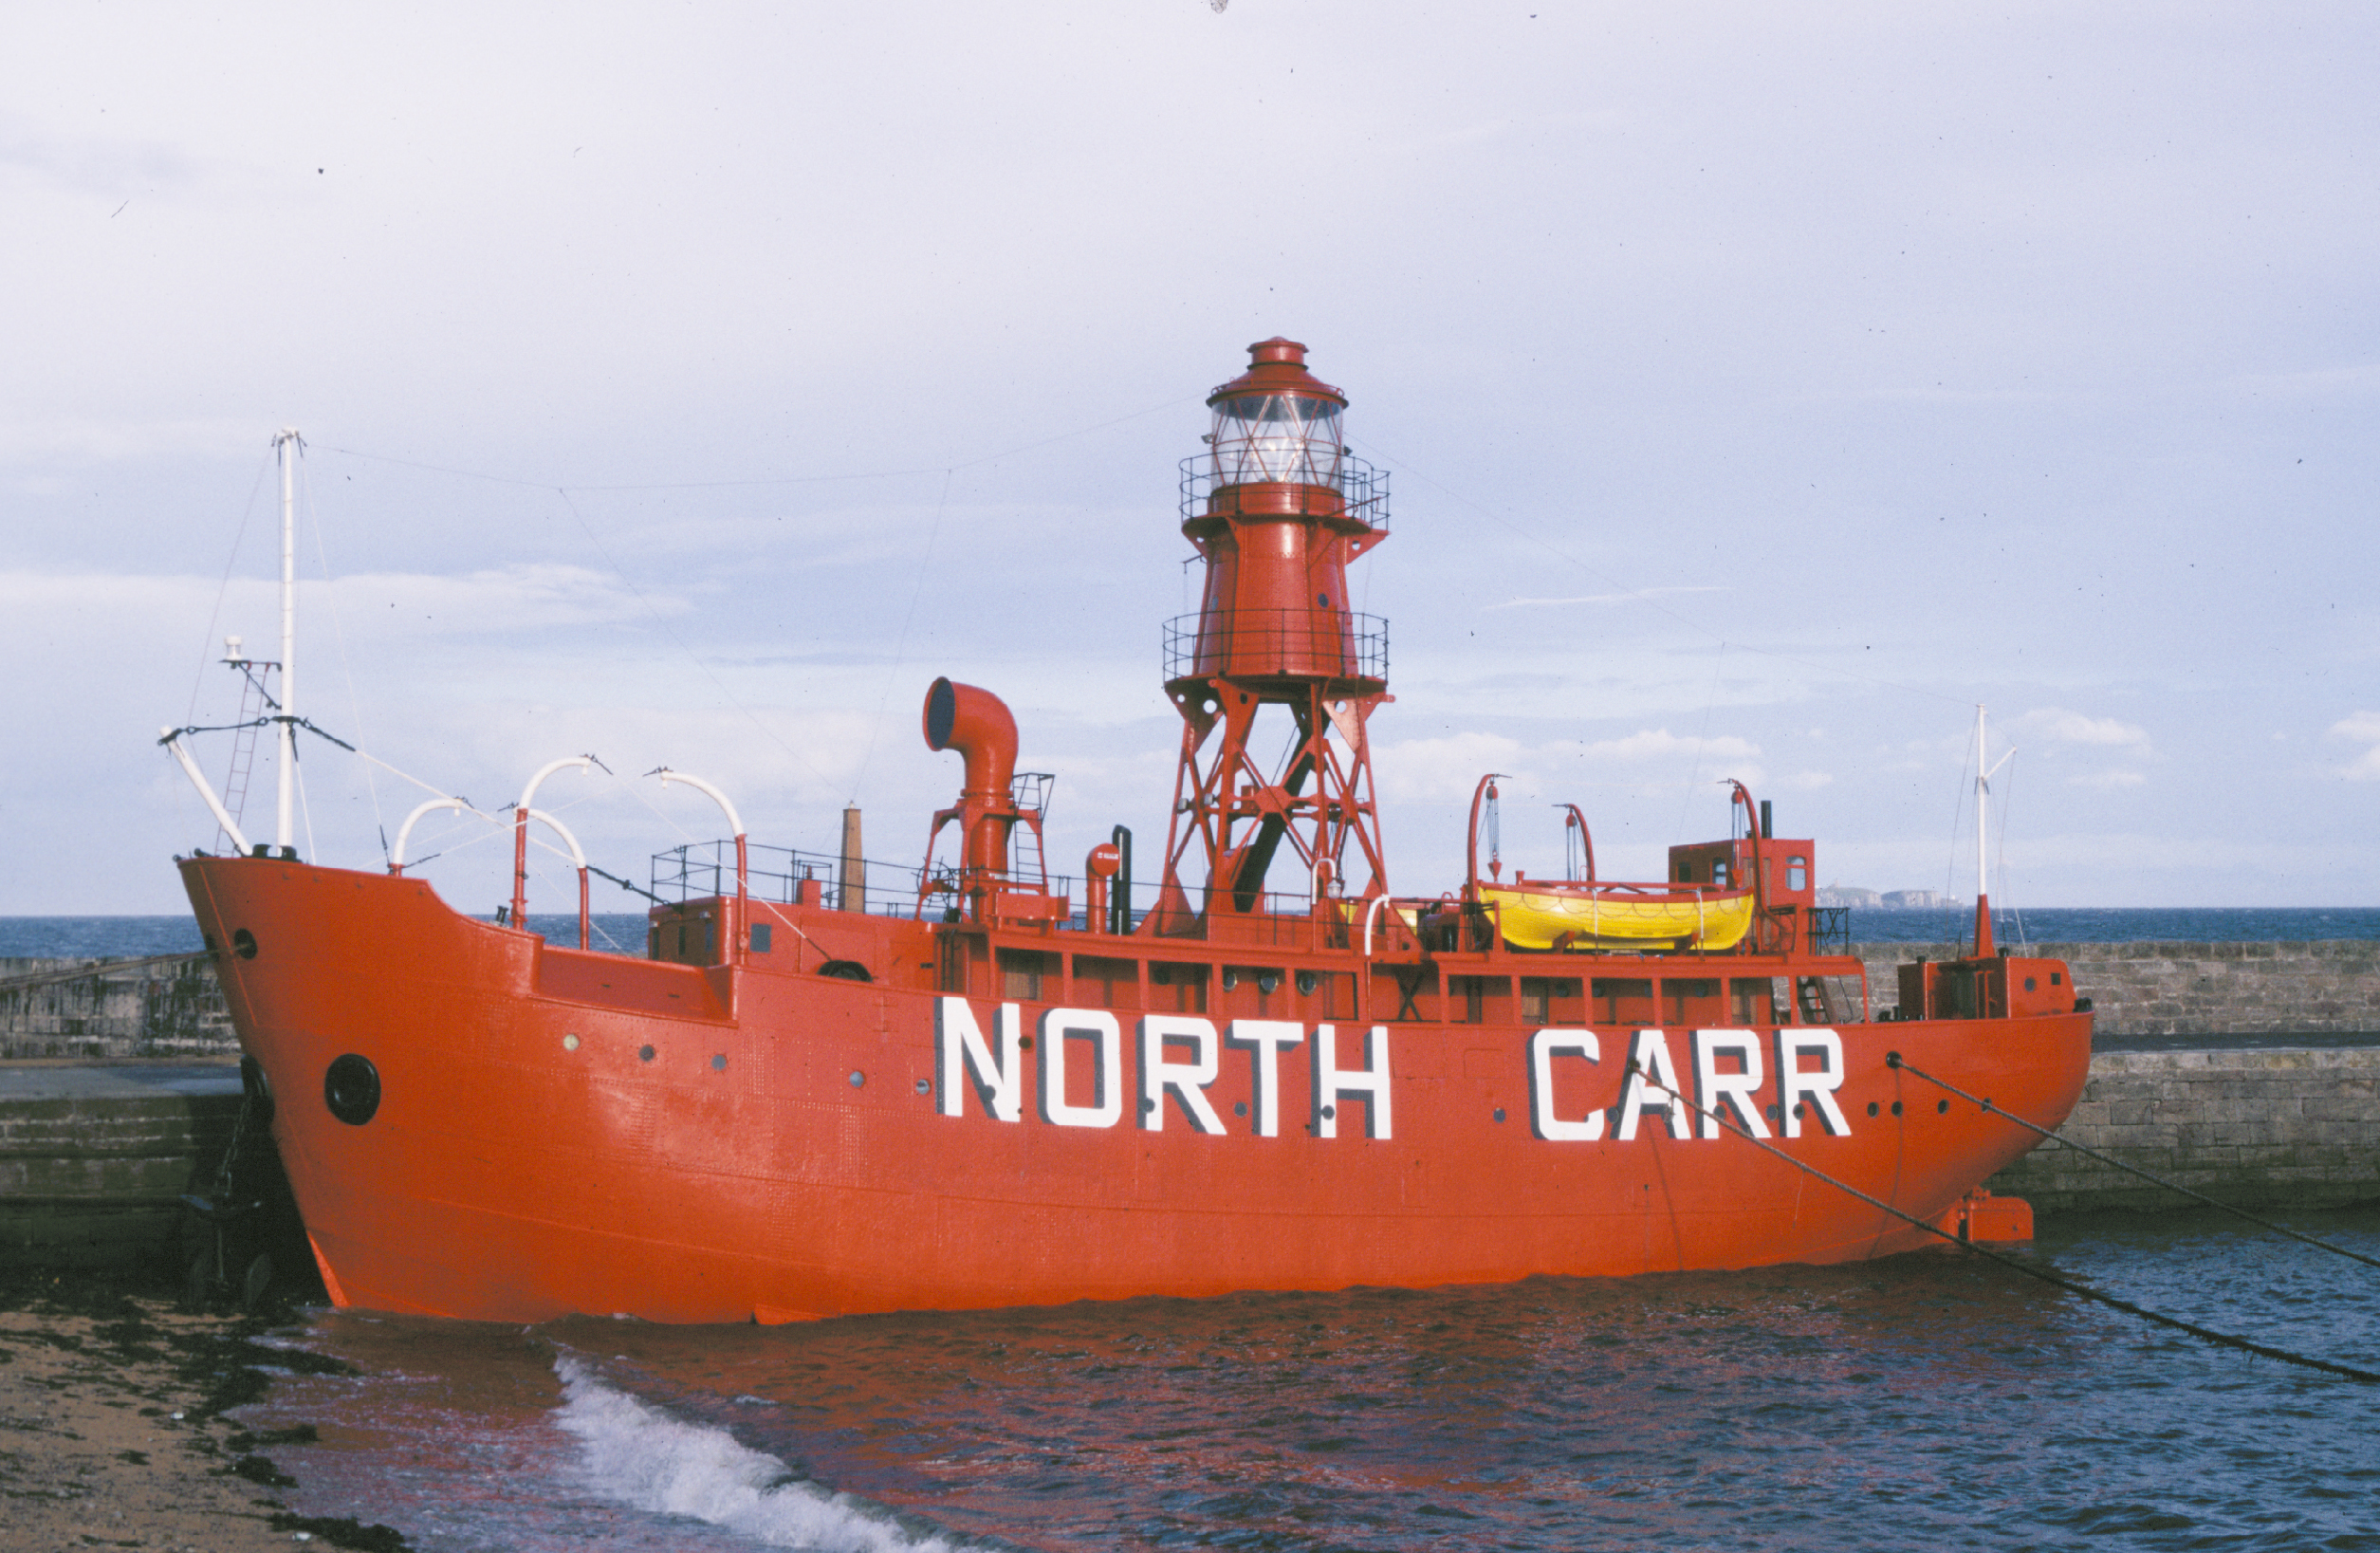 North_carr_light_ship_1988